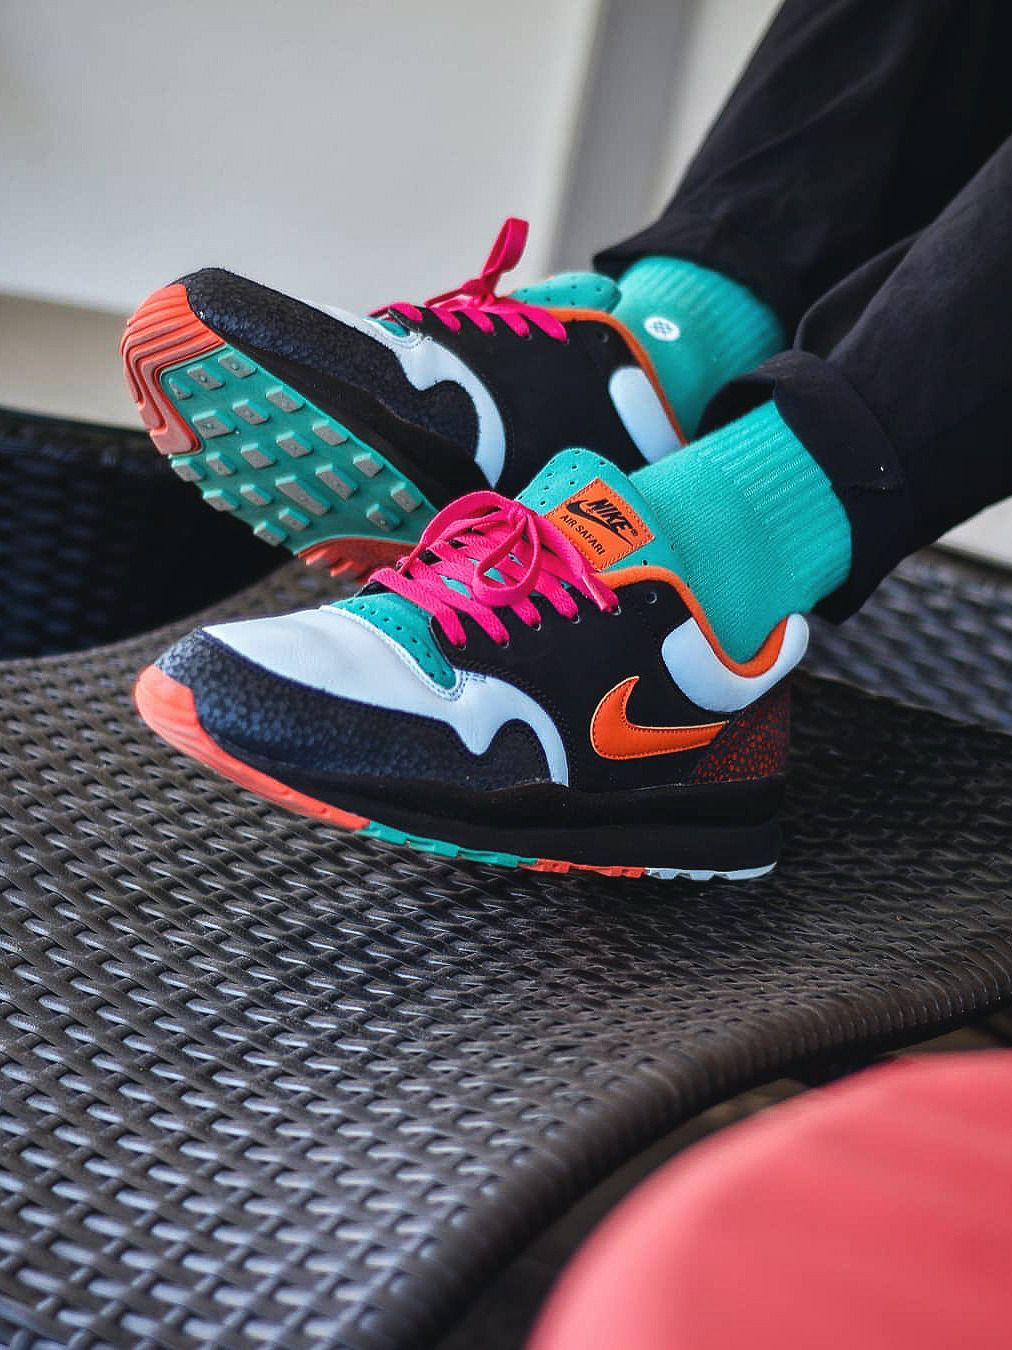 promo code f8834 14a5a Nike Air Safari SE - Black/Team Orange - 2018 (by ...